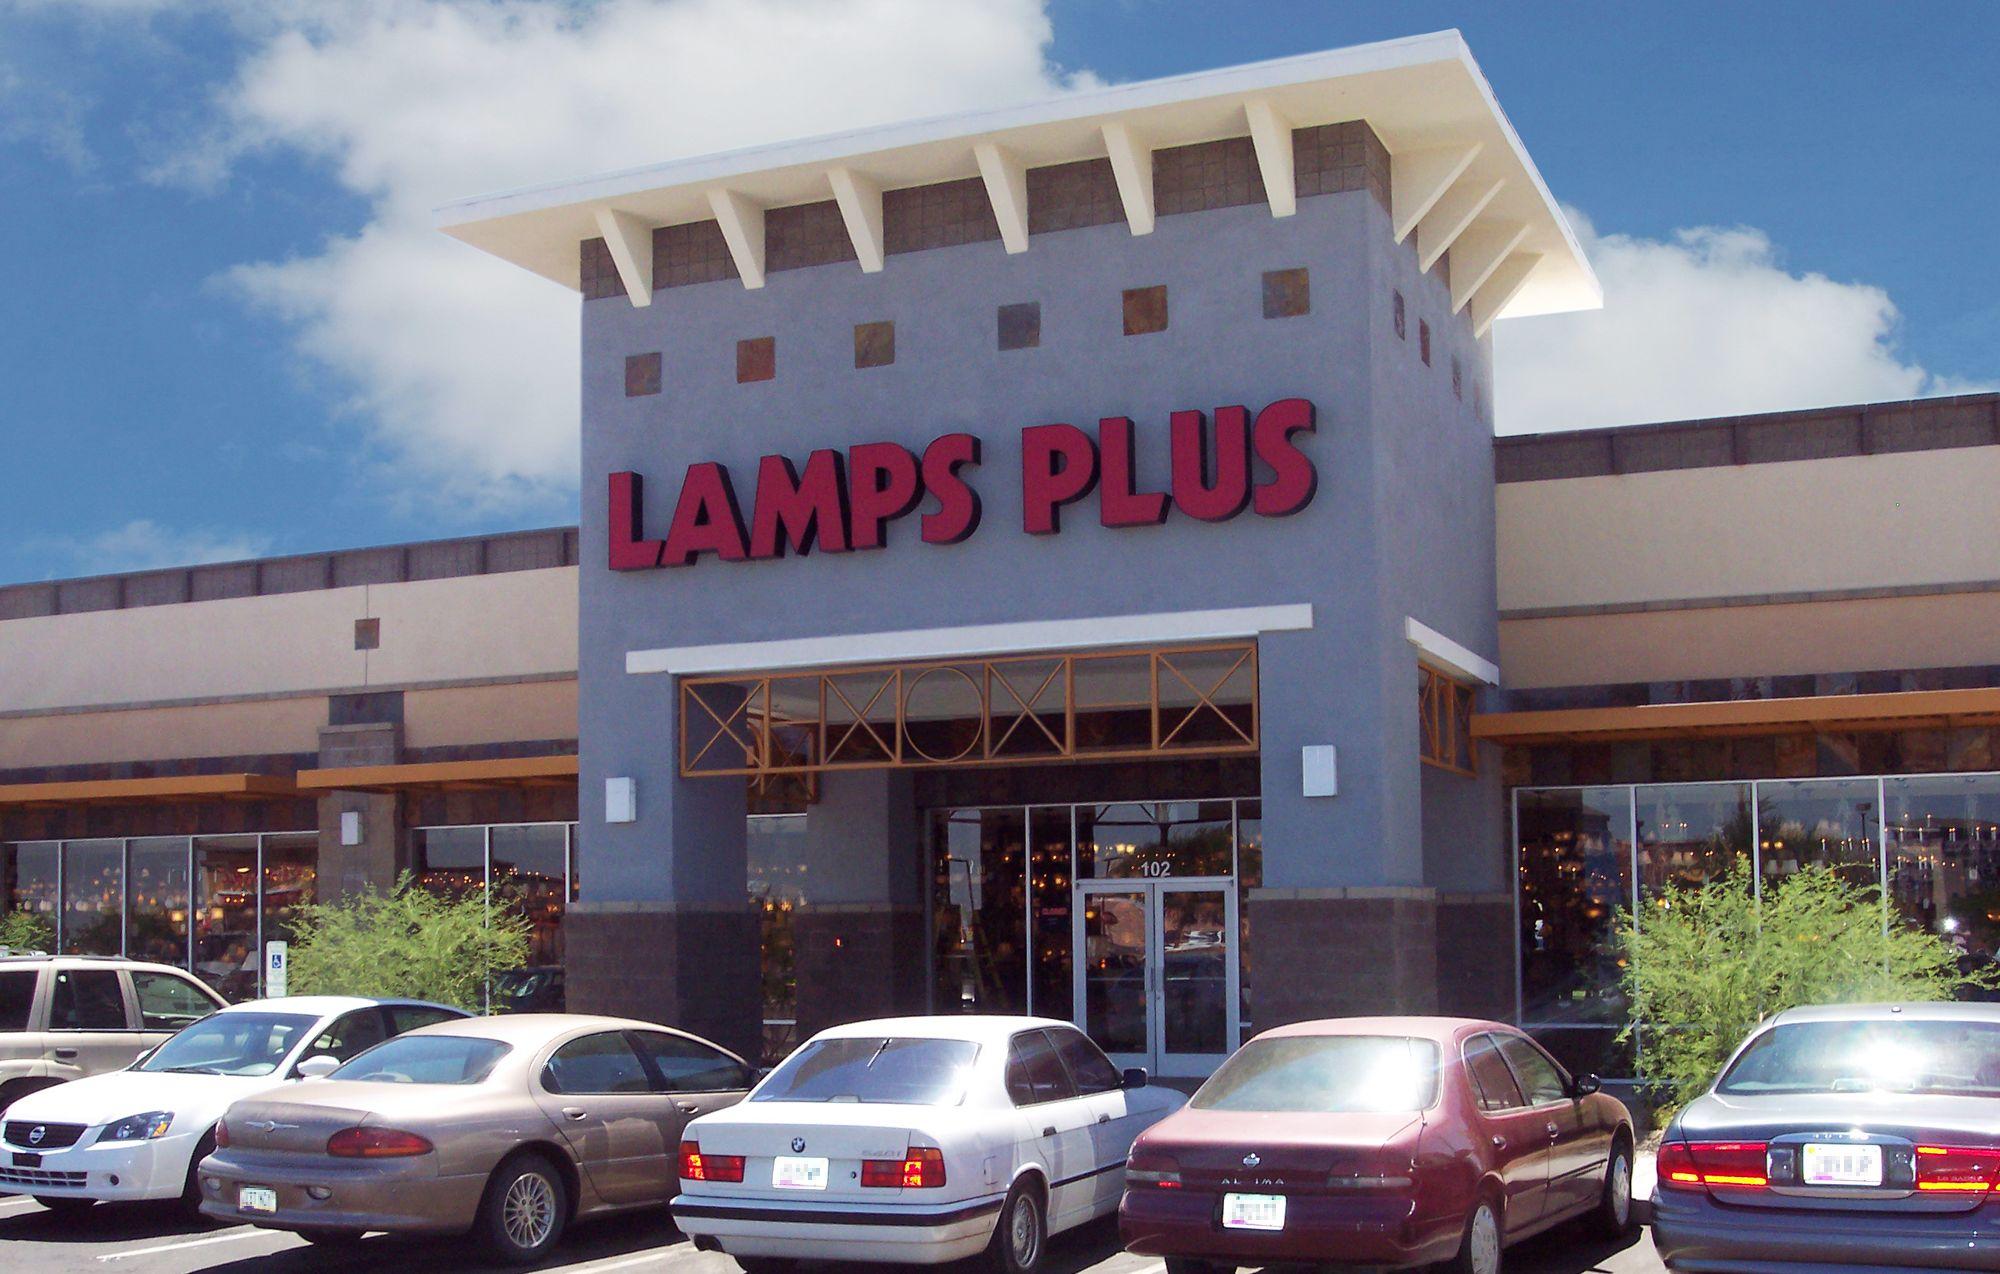 L&s Plus Peoria AZ #60 & Lamps Plus Peoria AZ N 83rd Ave - Lighting Stores Phoenix Arizona